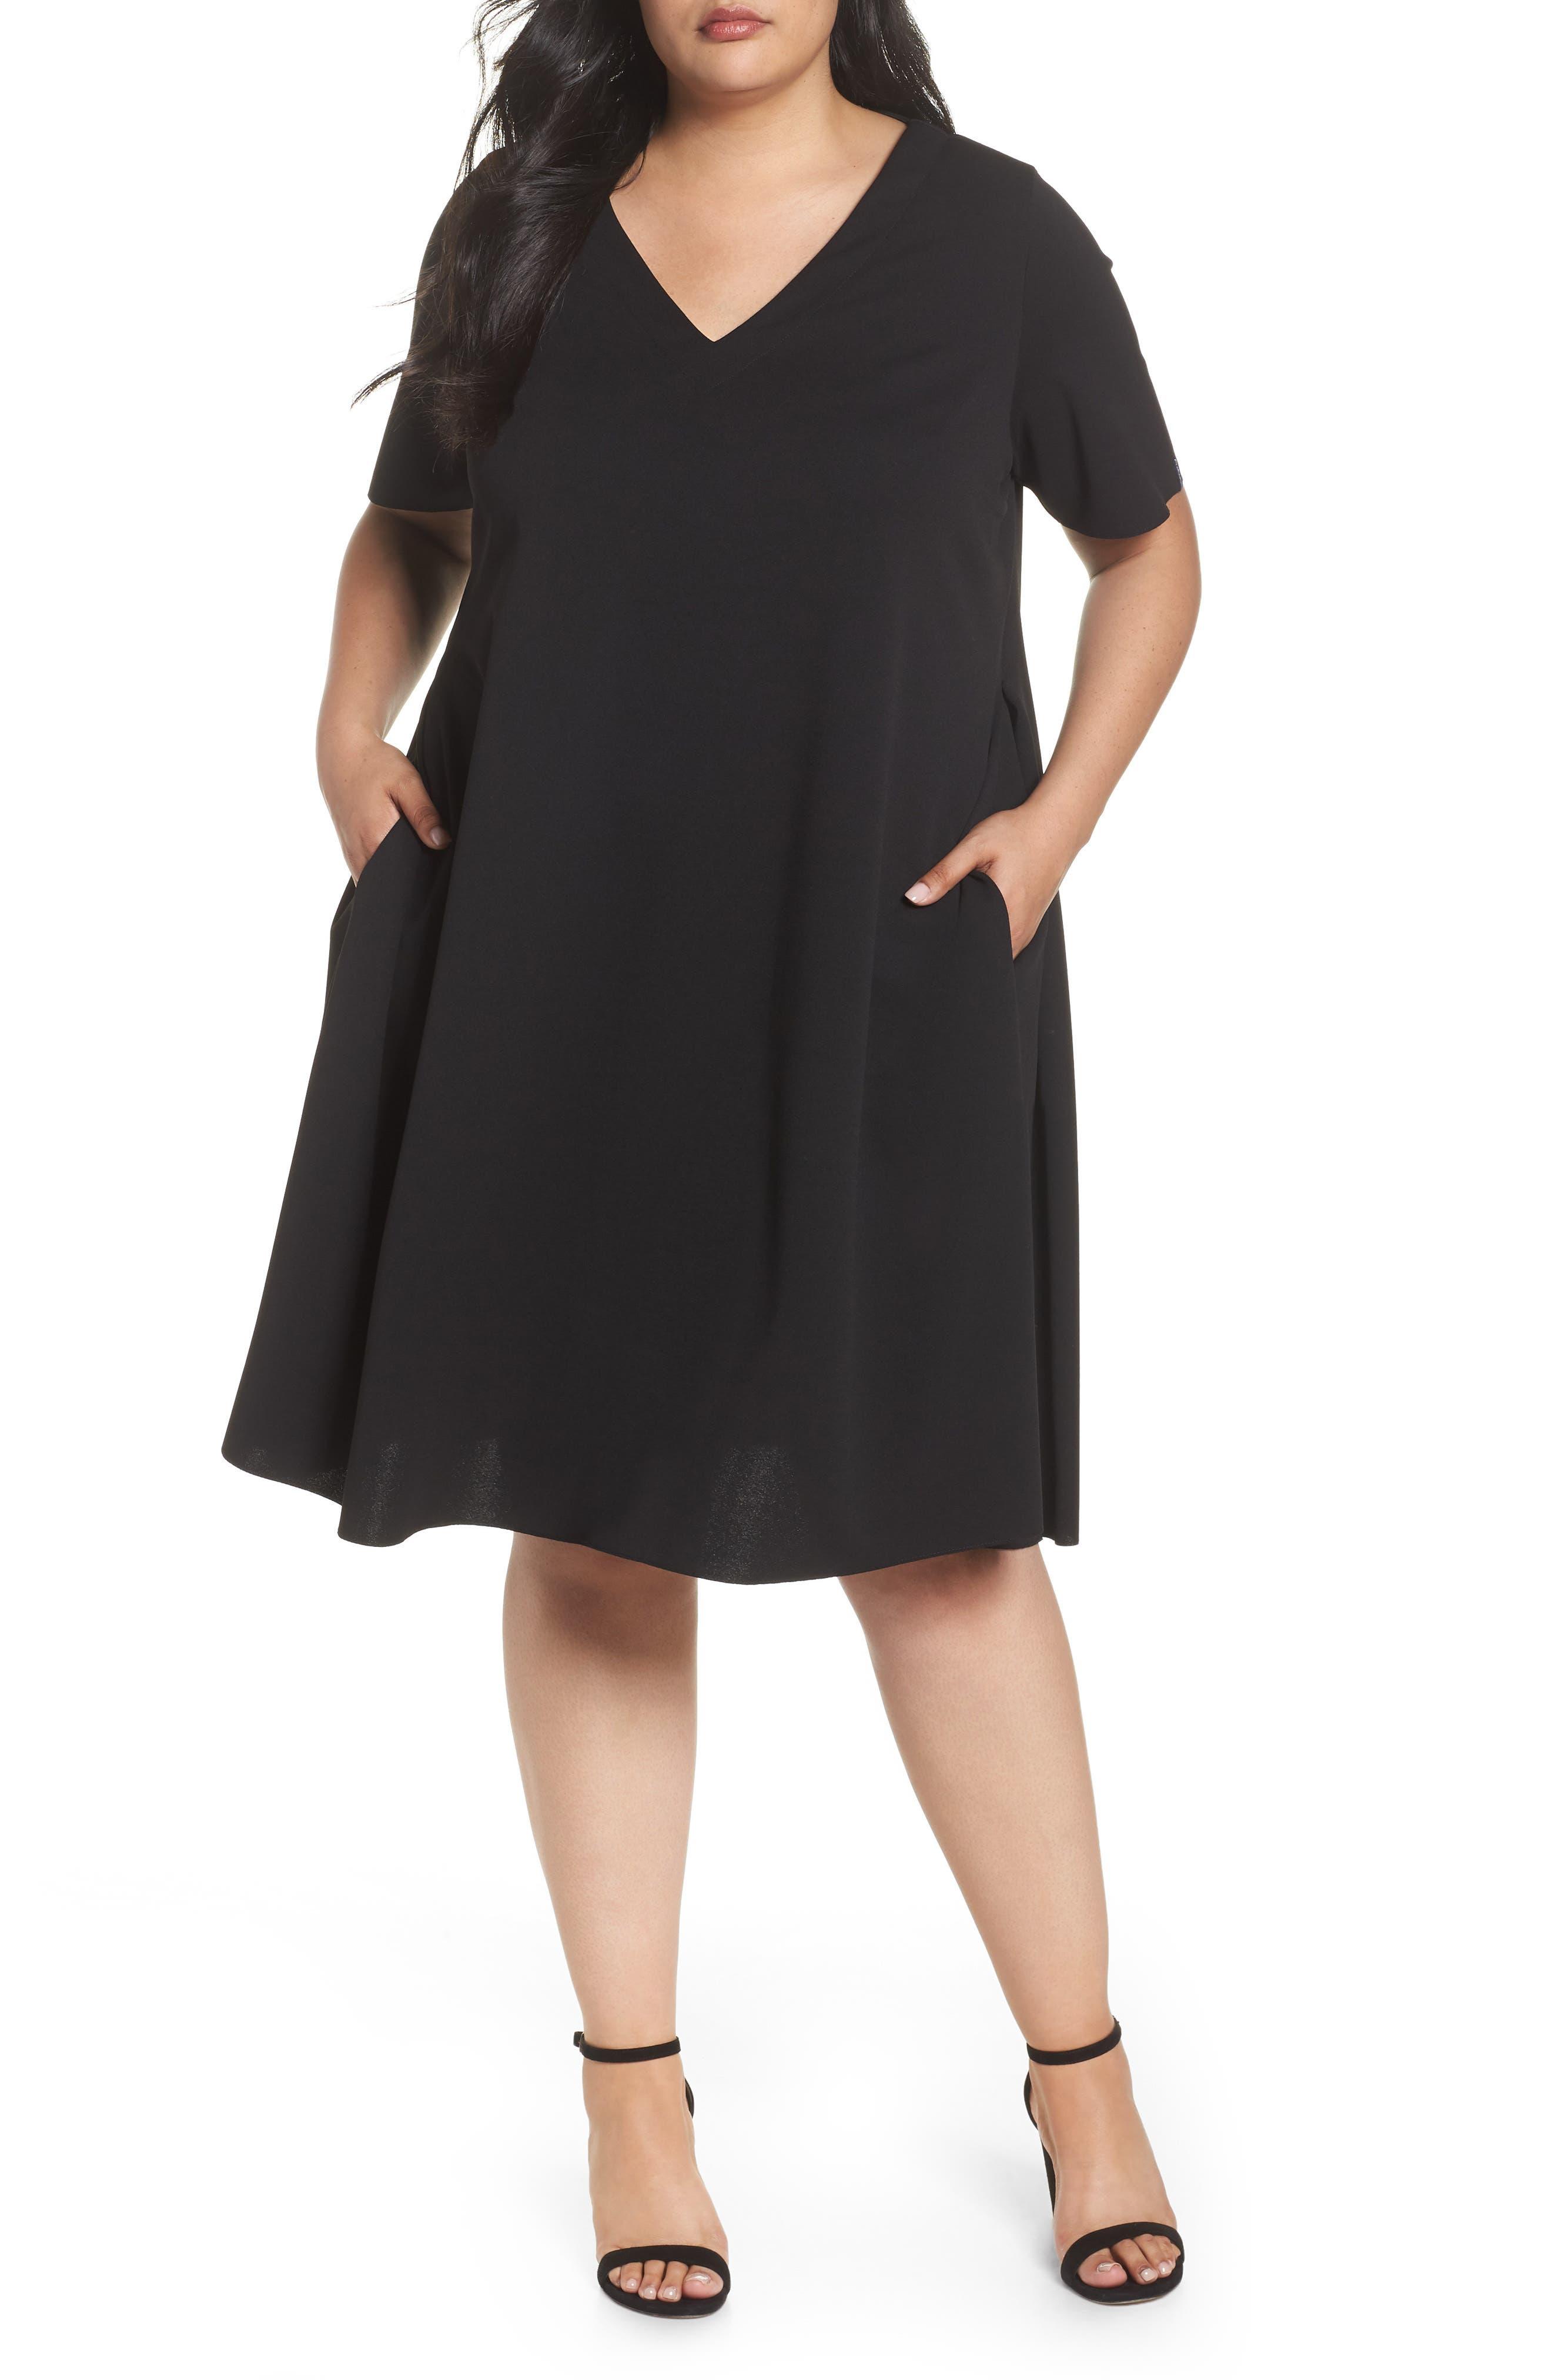 Short Sleeve Knit Dress,                             Main thumbnail 1, color,                             Black